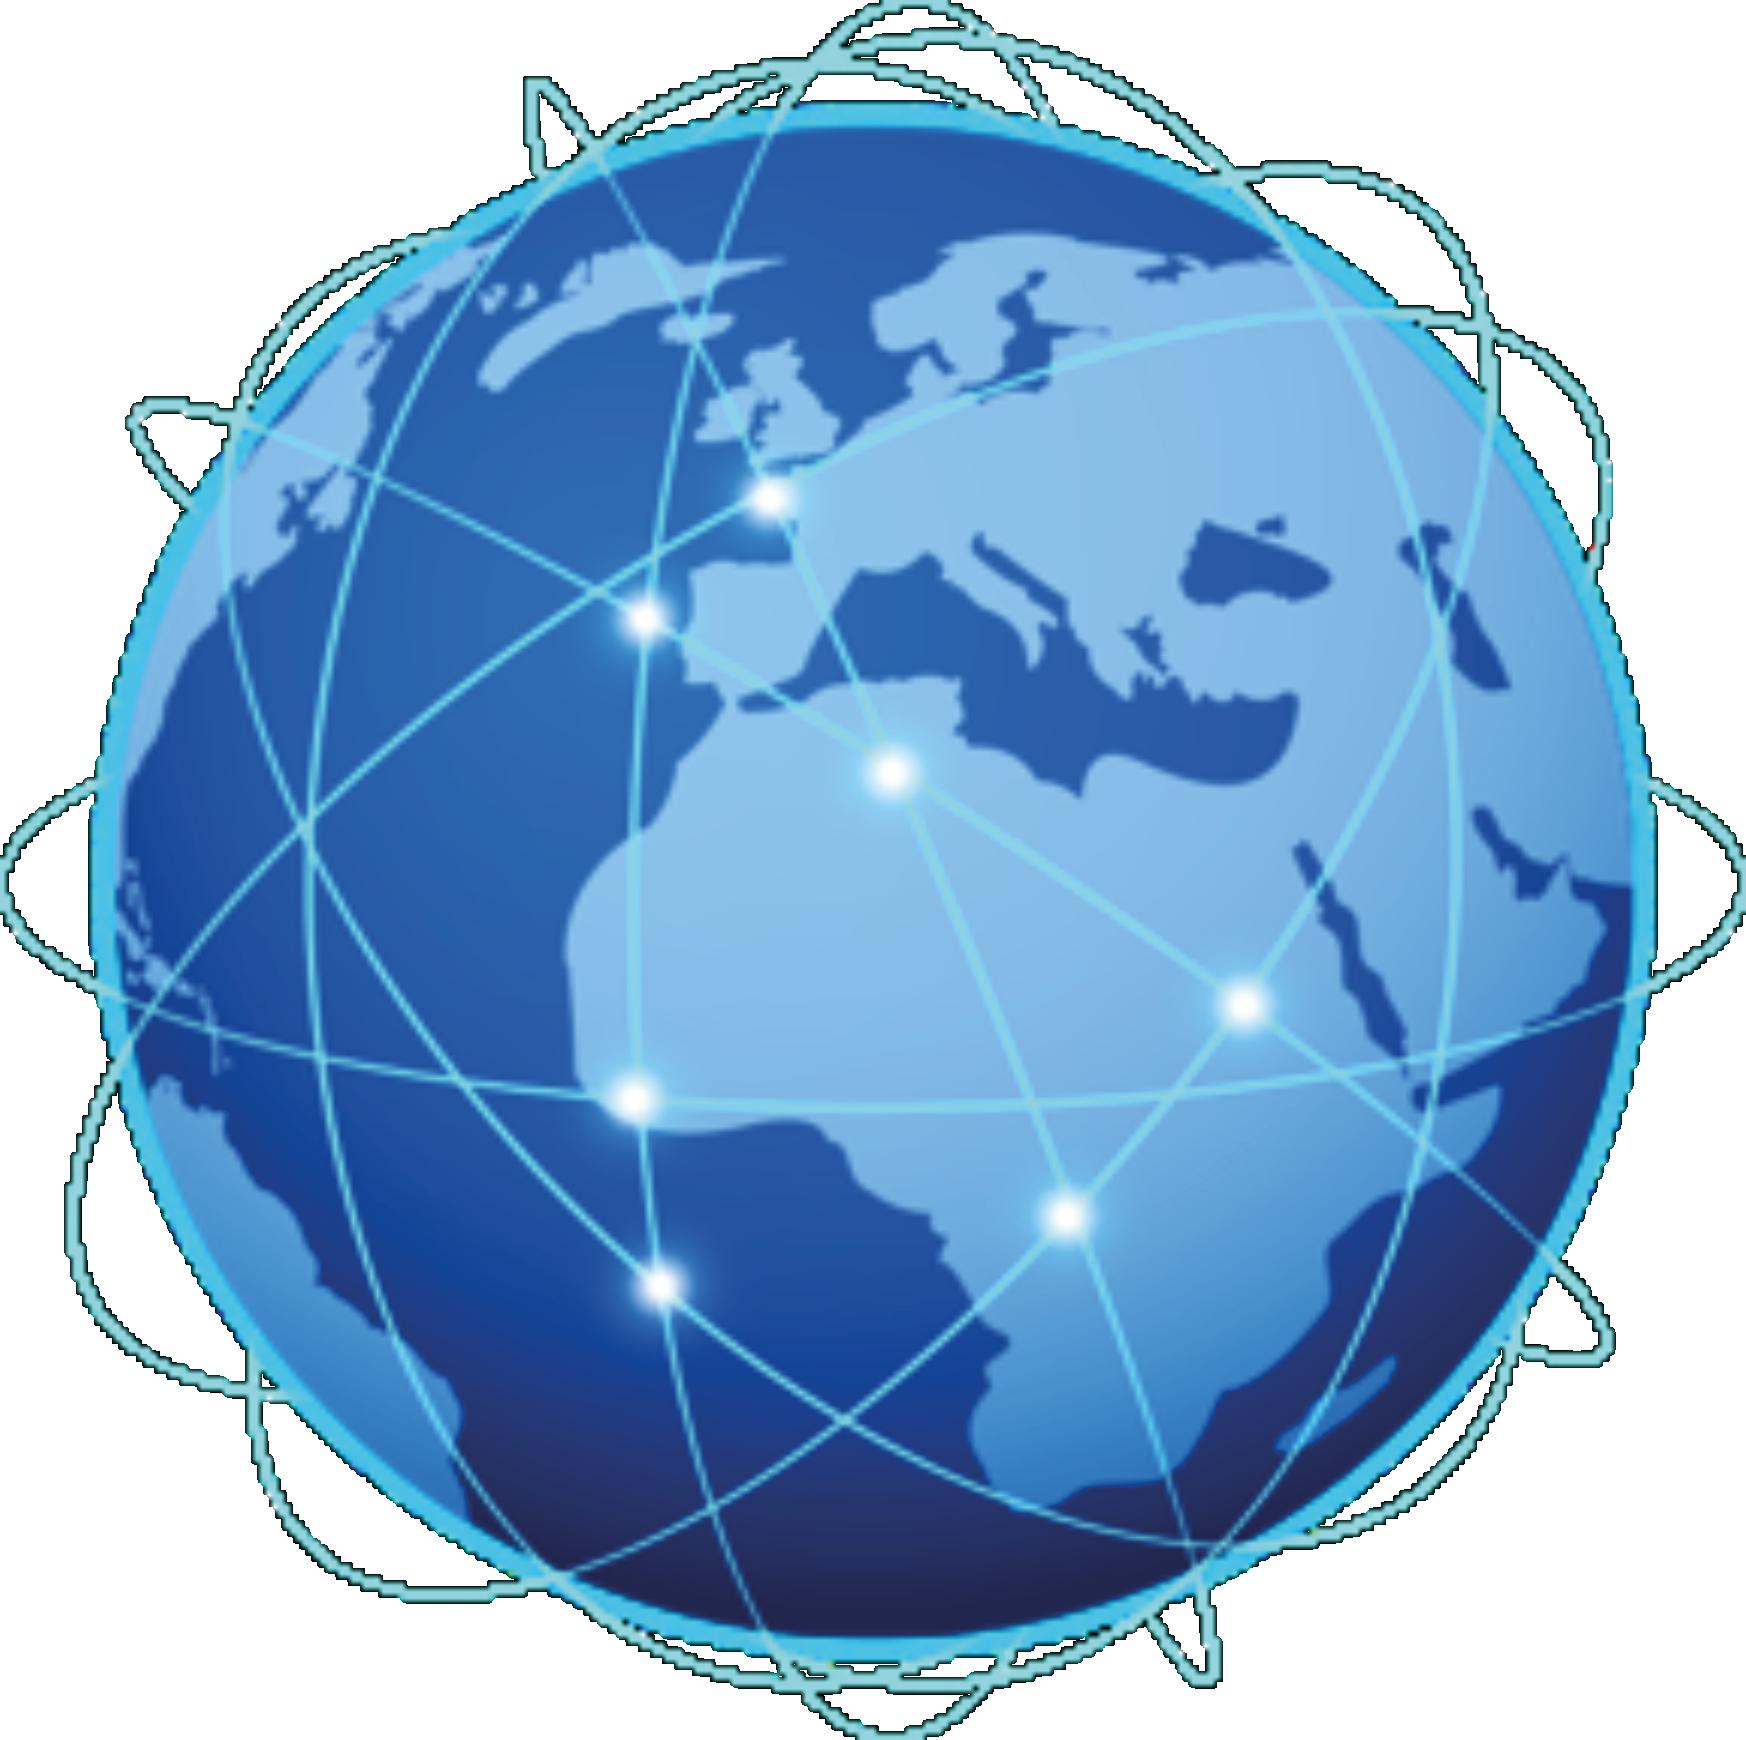 Vernetzte Standorte Weltkugel